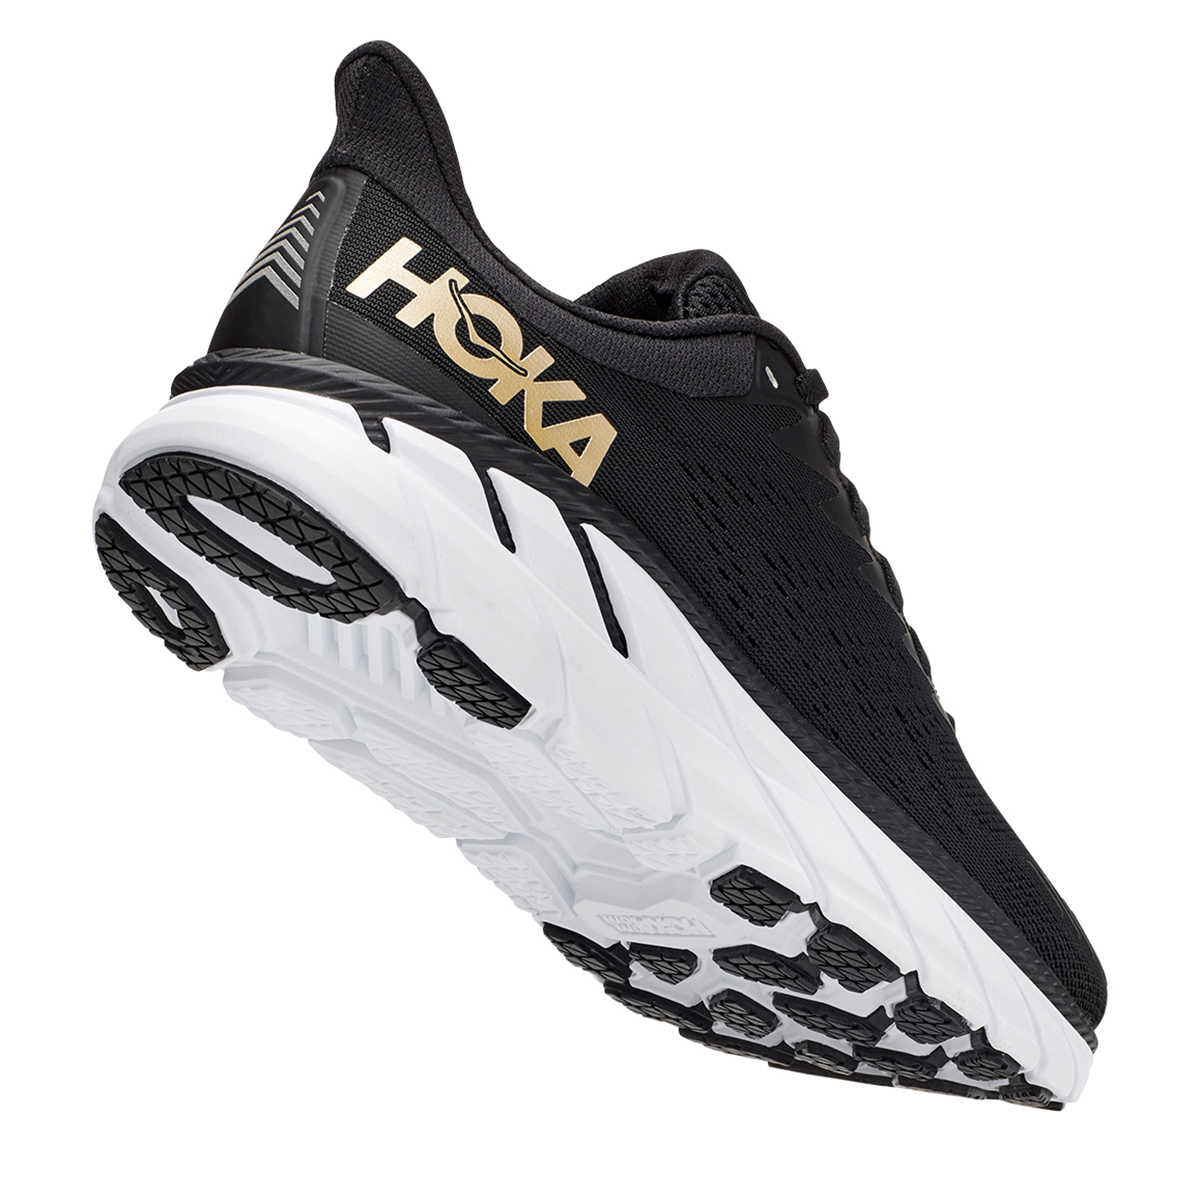 Women's Hoka One One Clifton 7 Running Shoe - Color: Black/Bronze - Size: 5 - Width: Regular, Black/Bronze, large, image 5